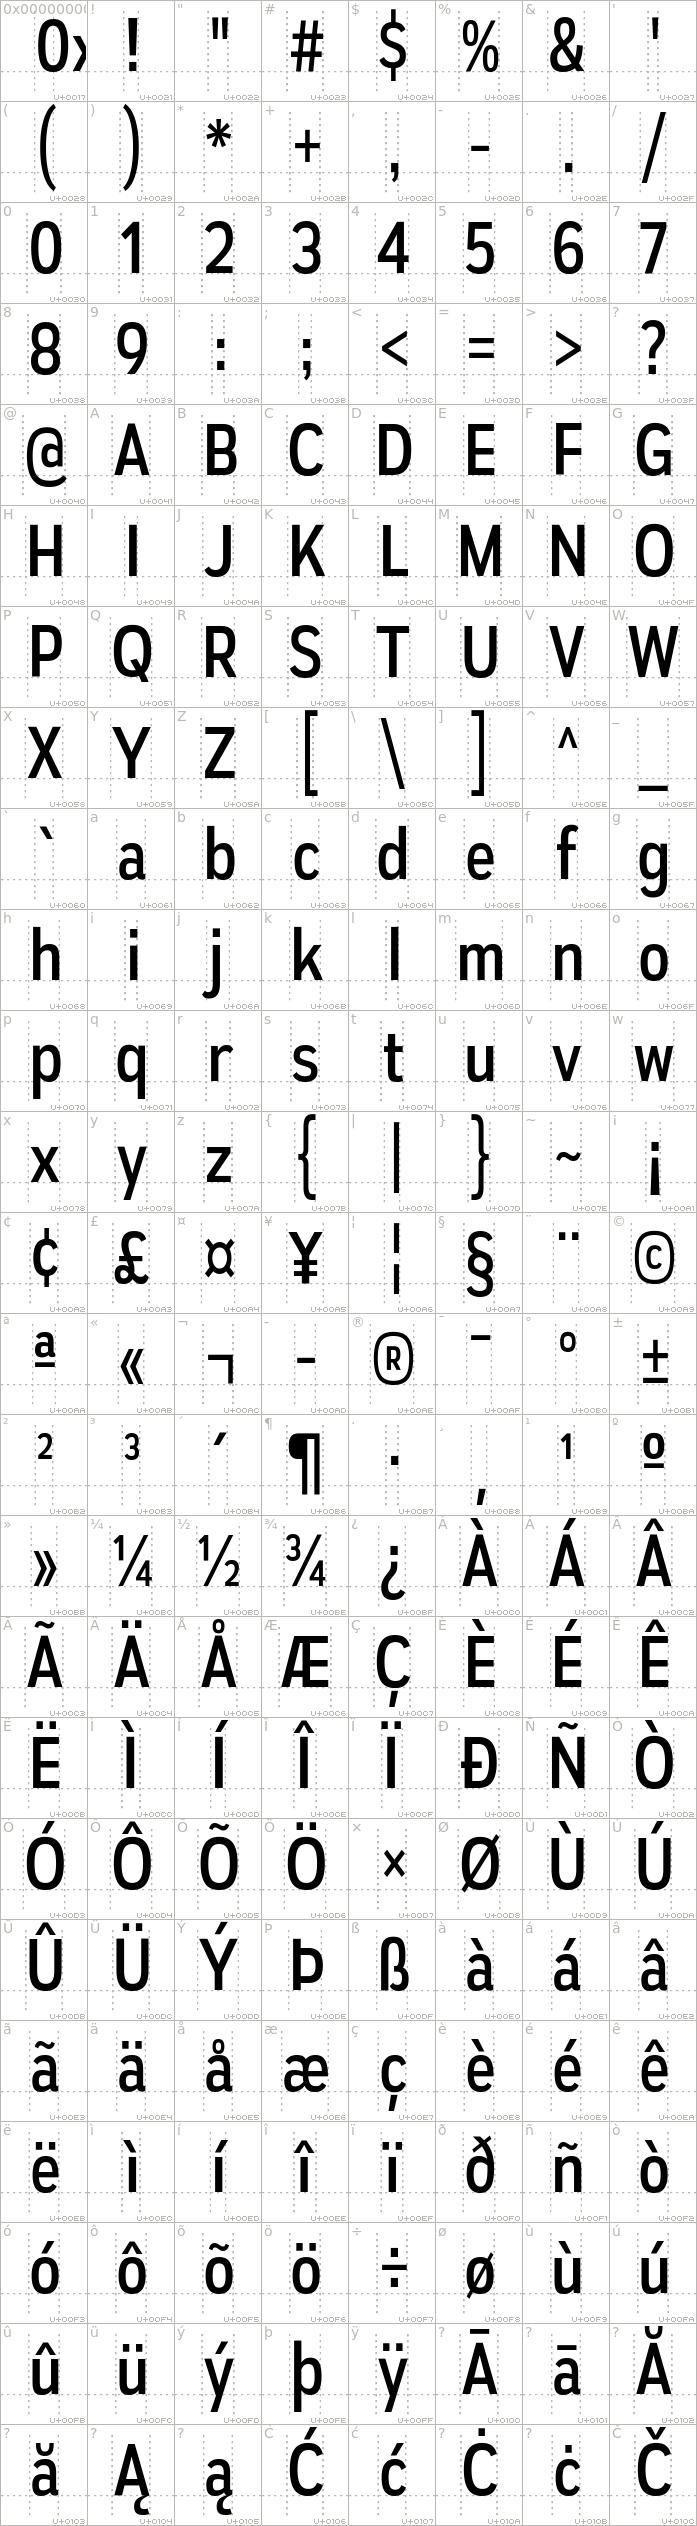 autoradiographic.regular.character-map-1